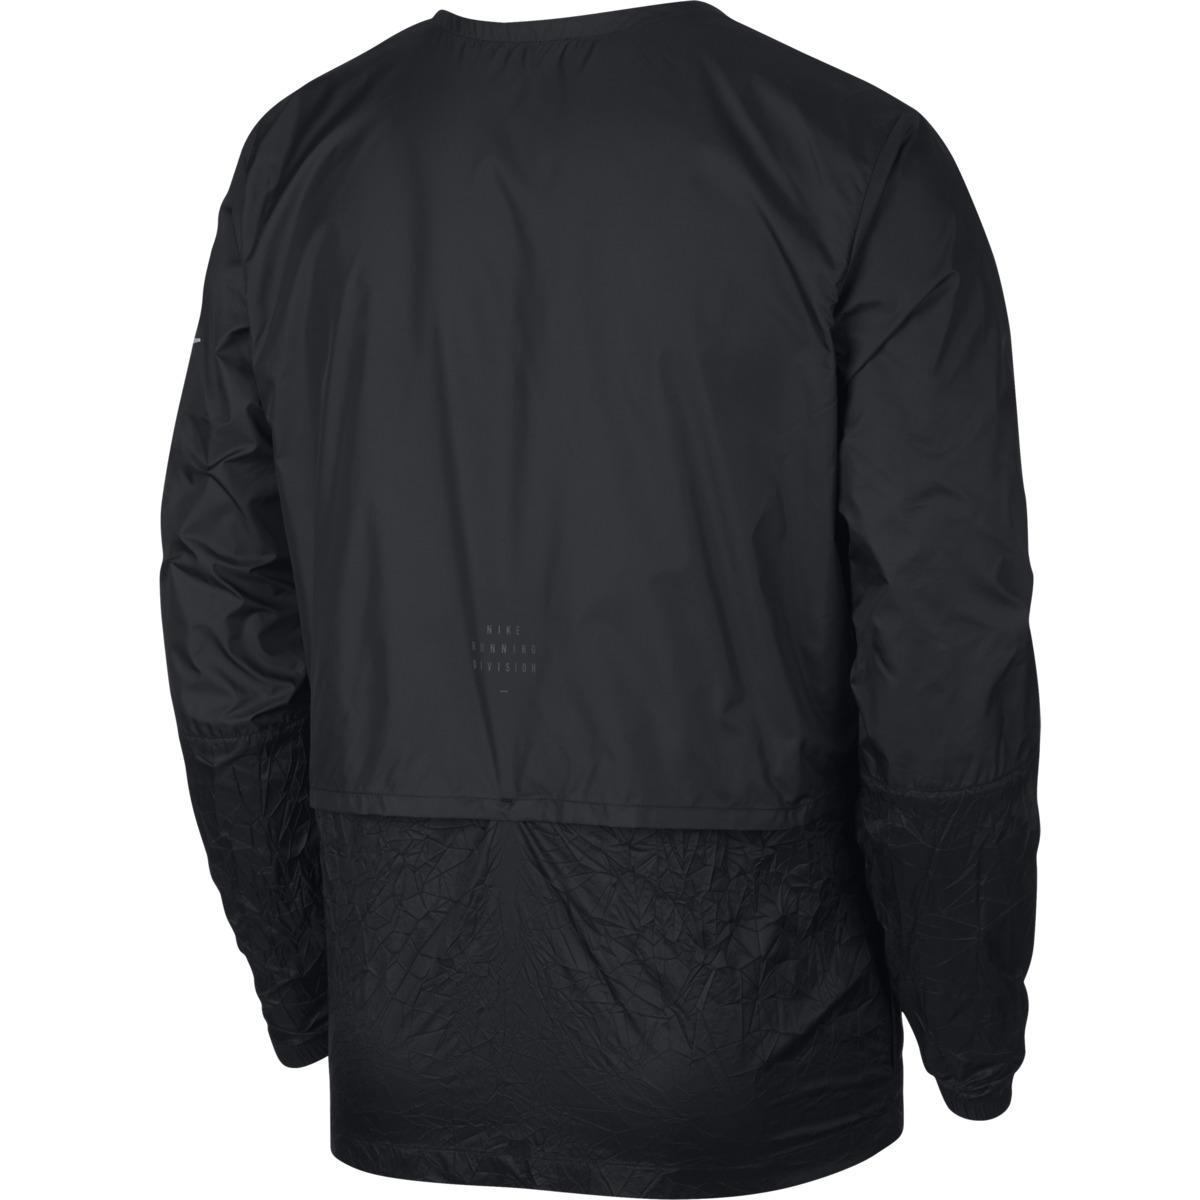 16f6862a90d5 Nike - Black Crew Windcheater Jacket for Men - Lyst. View fullscreen